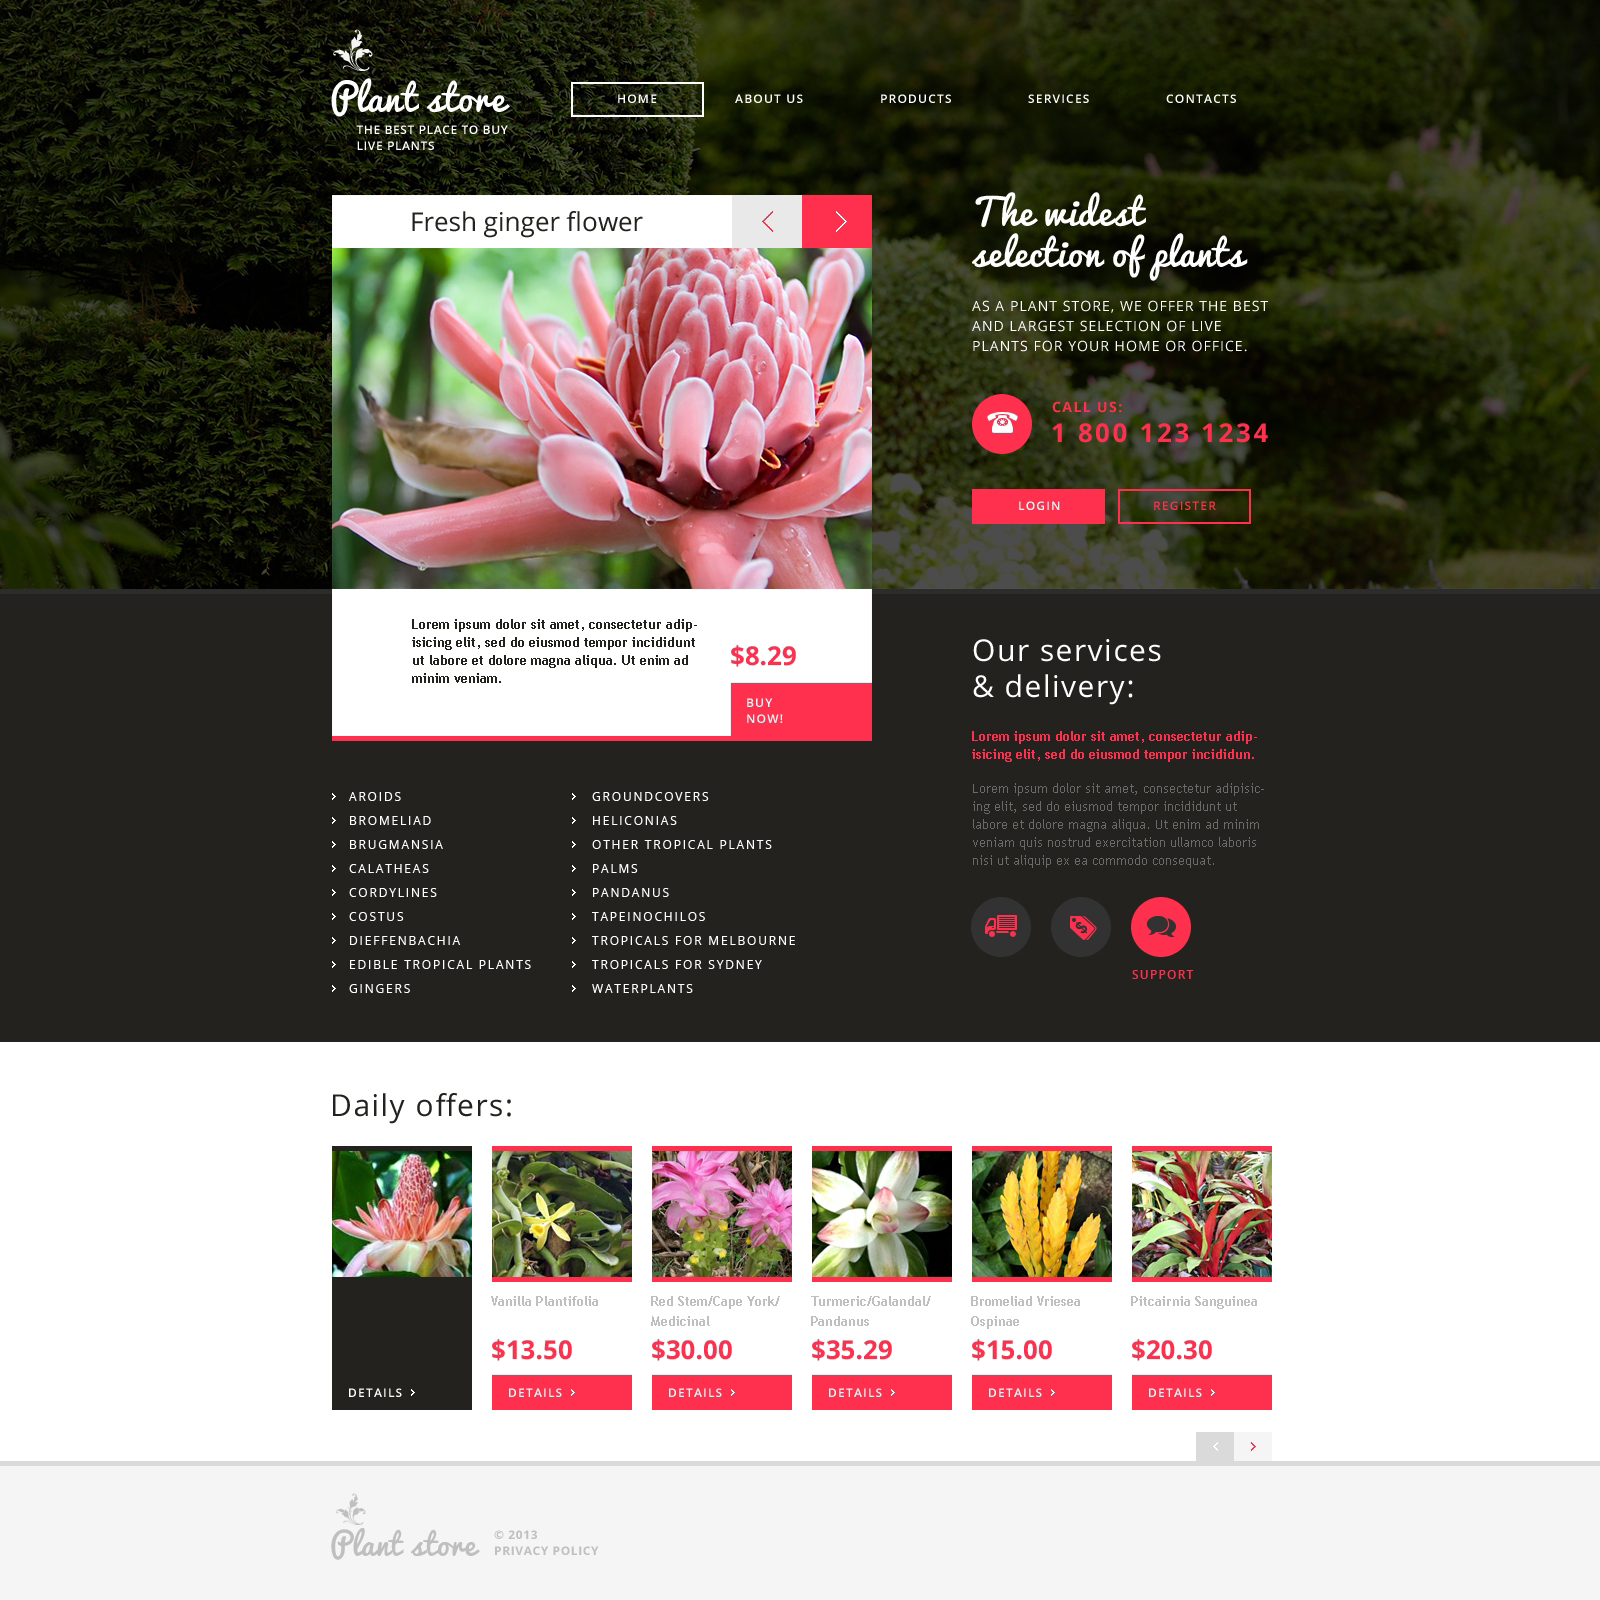 Flower Shop Website Templates | TemplateMonster